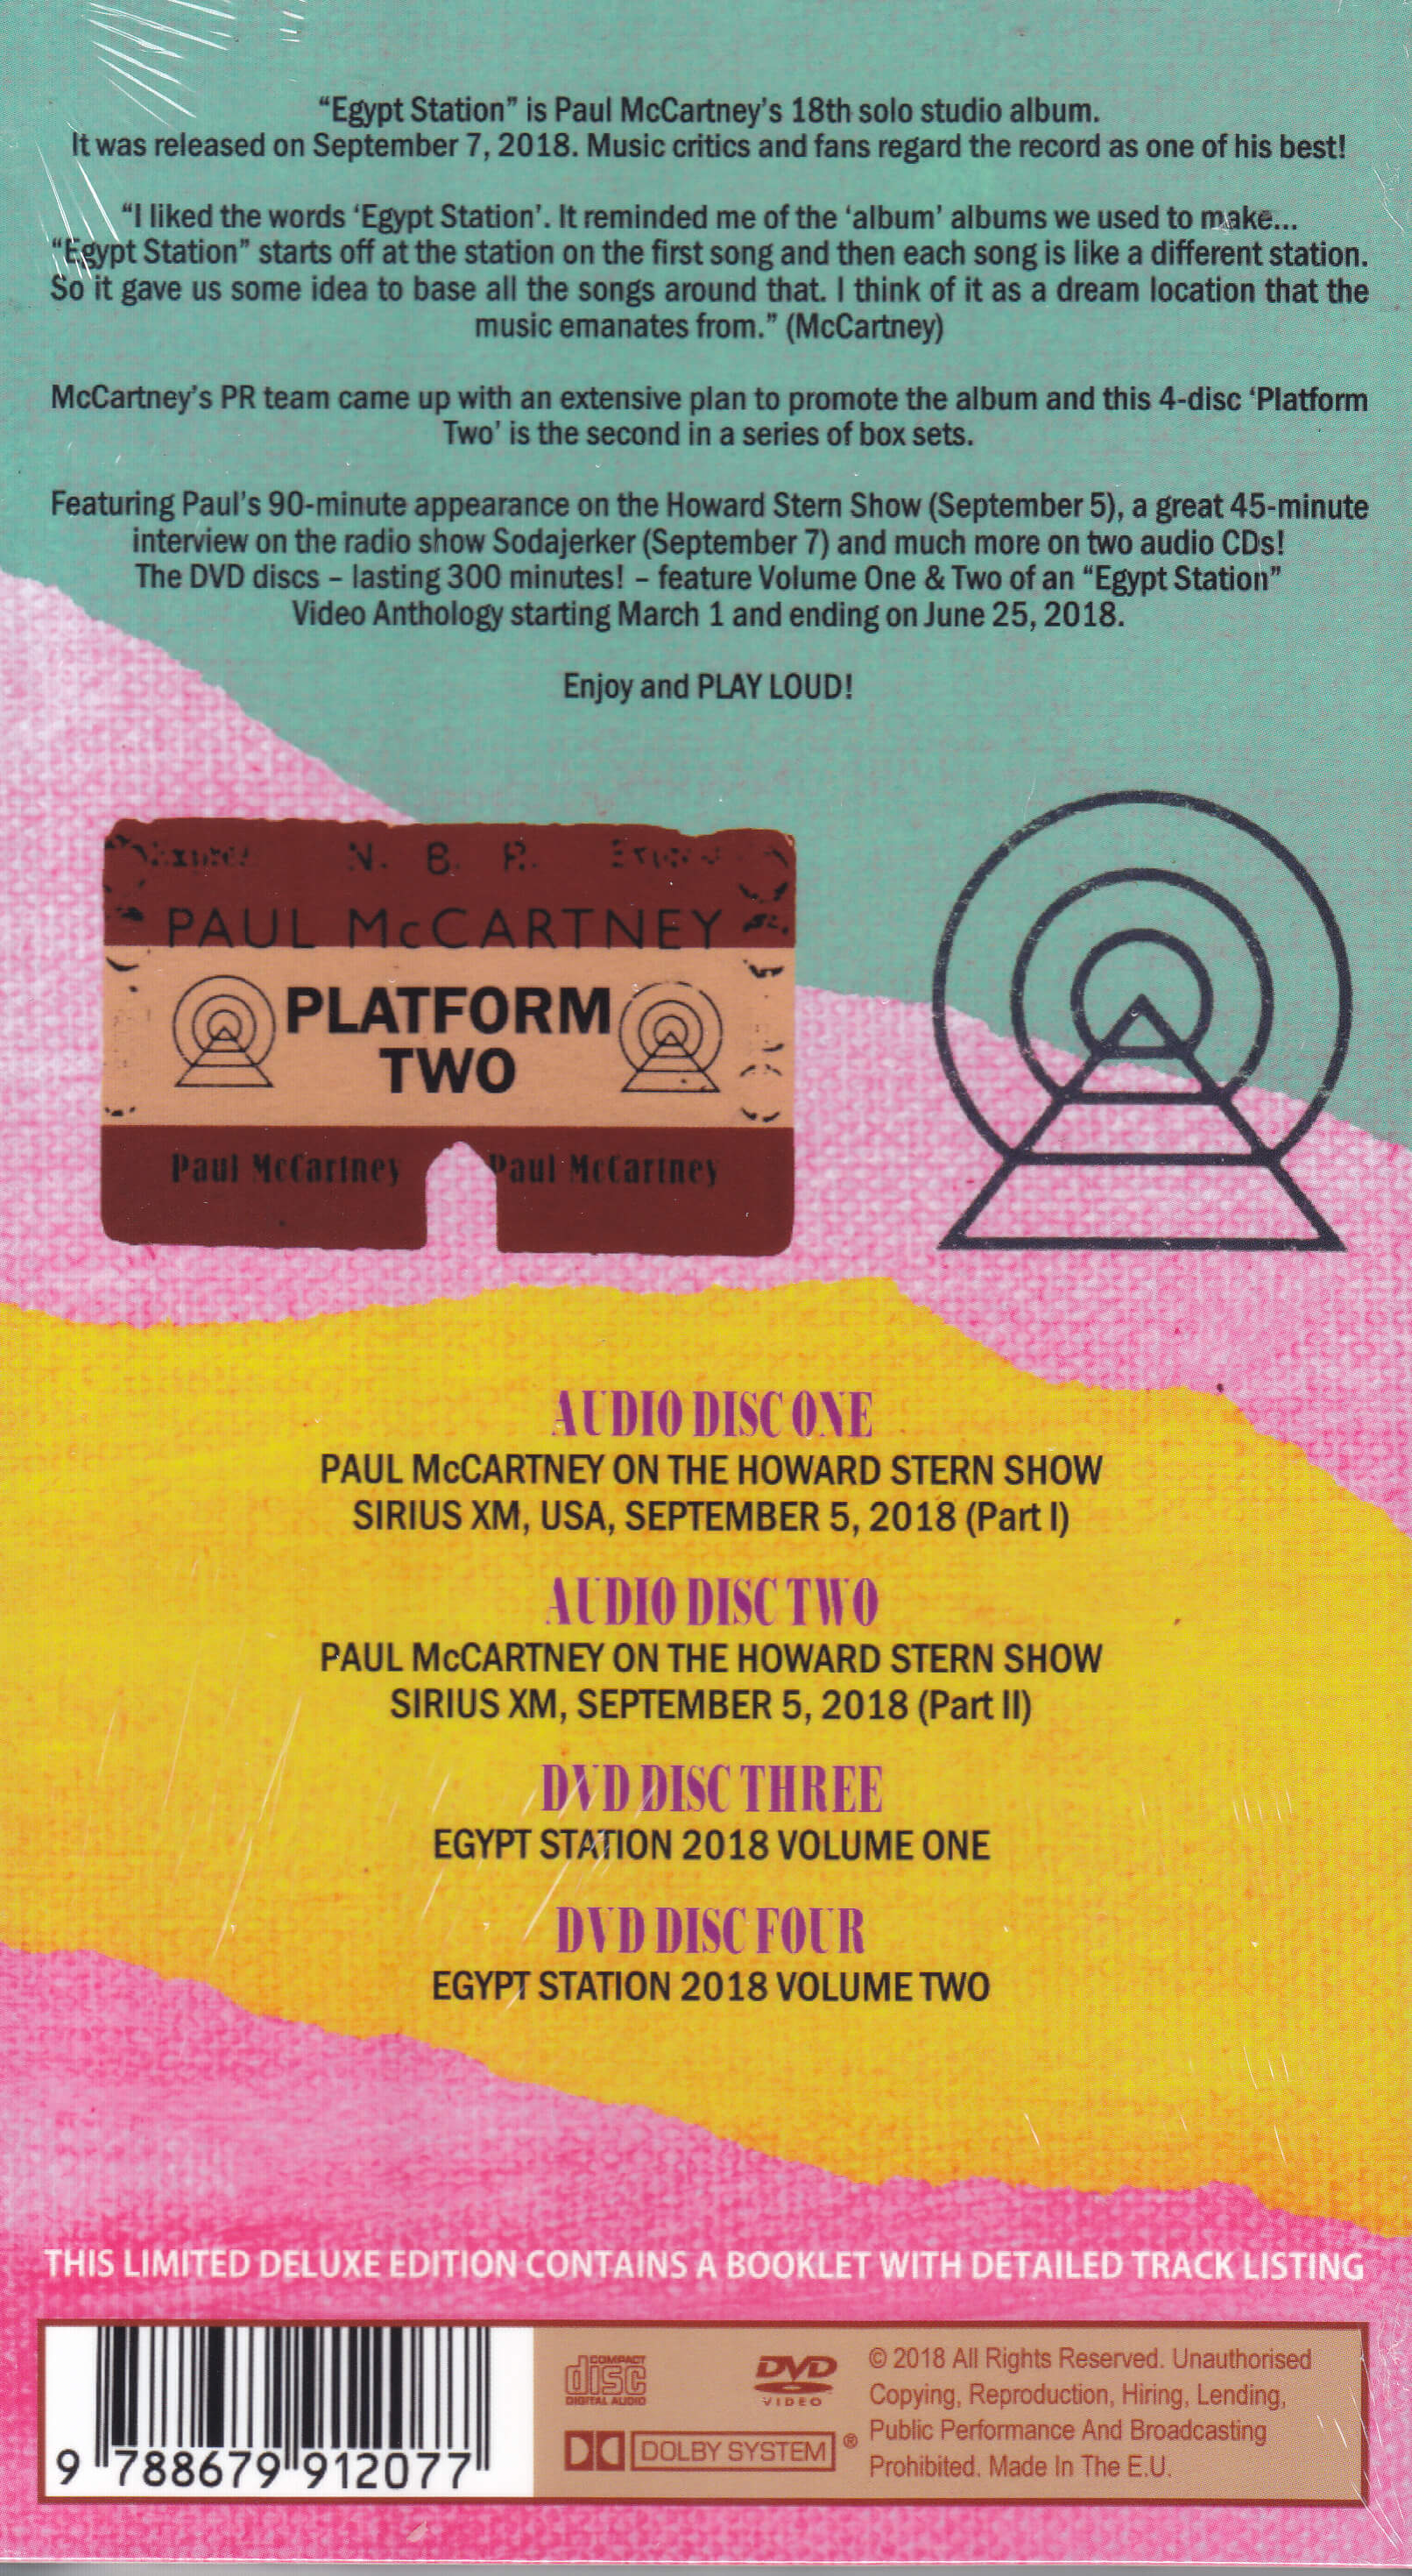 Paul McCartney - Egypt Station Promo Tour 2 (2CD+2DVD Long Box) LDN-182